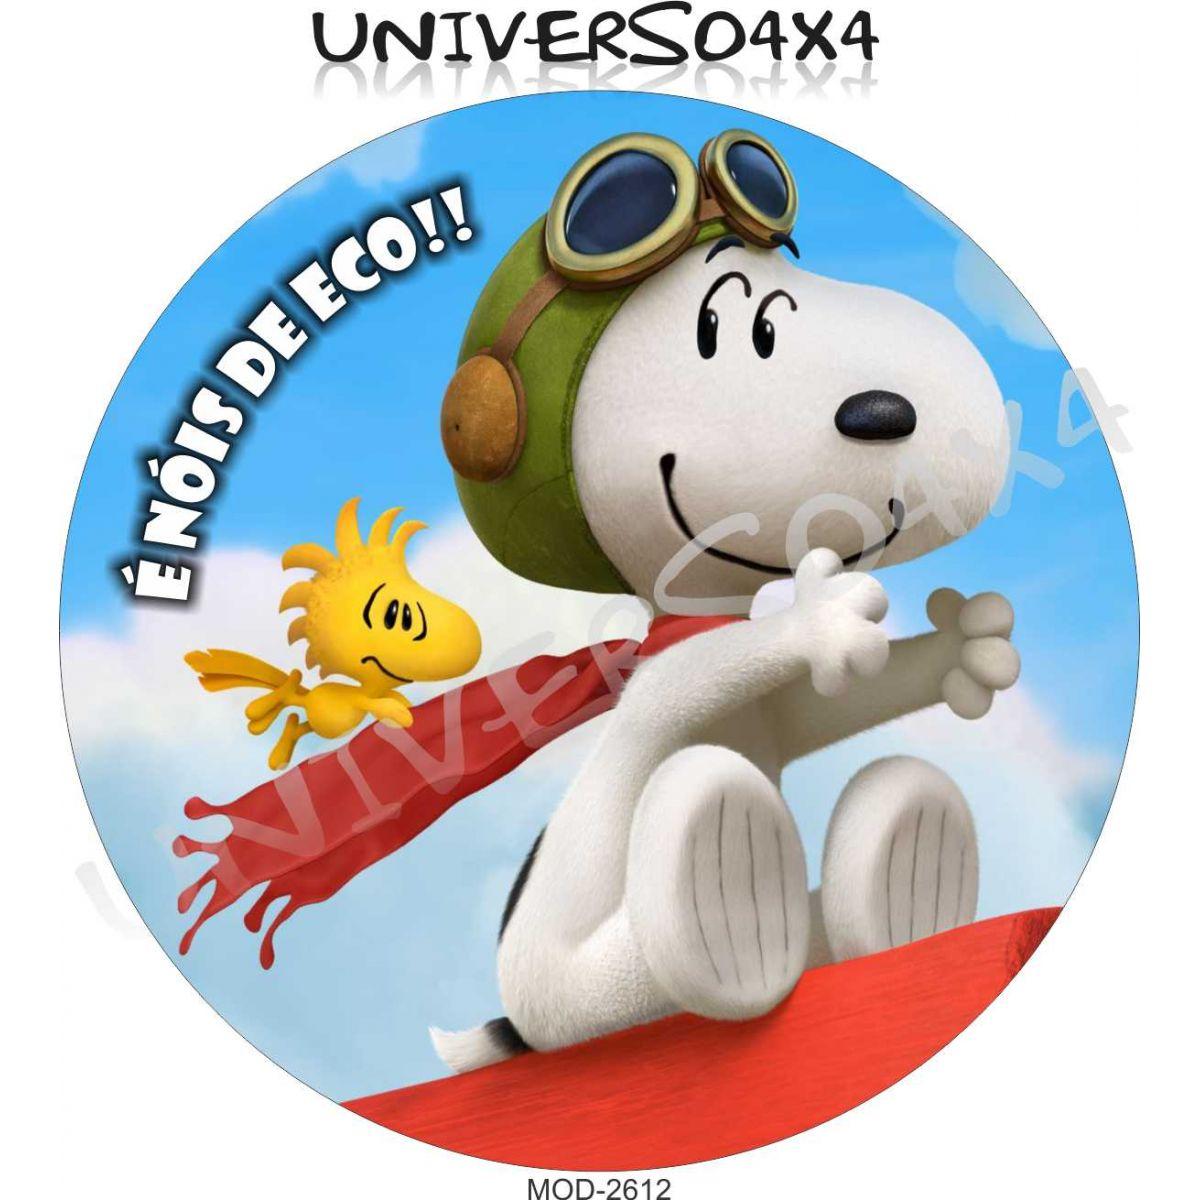 Capa Estepe Ecosport Snoopy M-2612